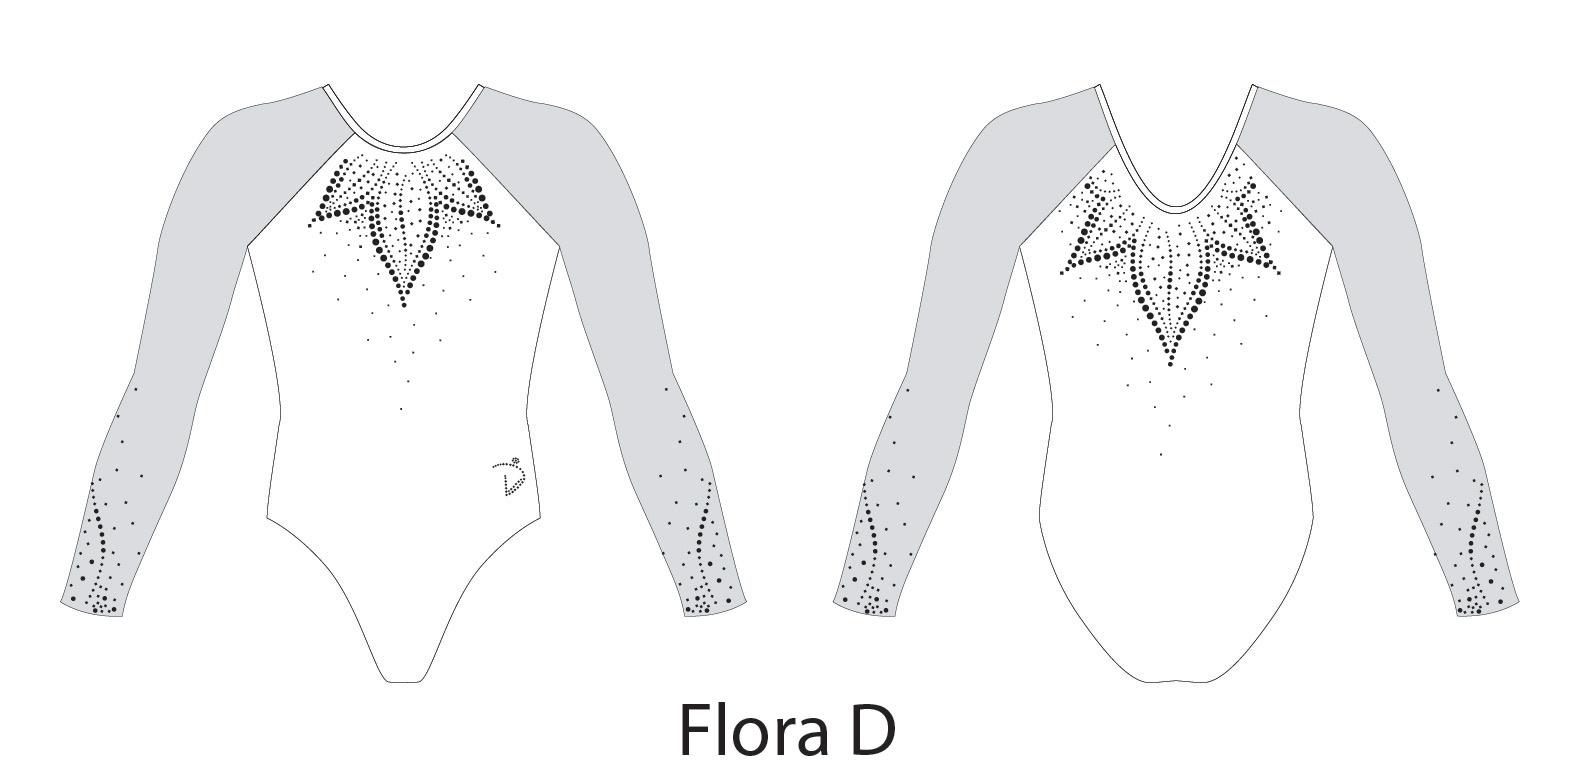 Flora D